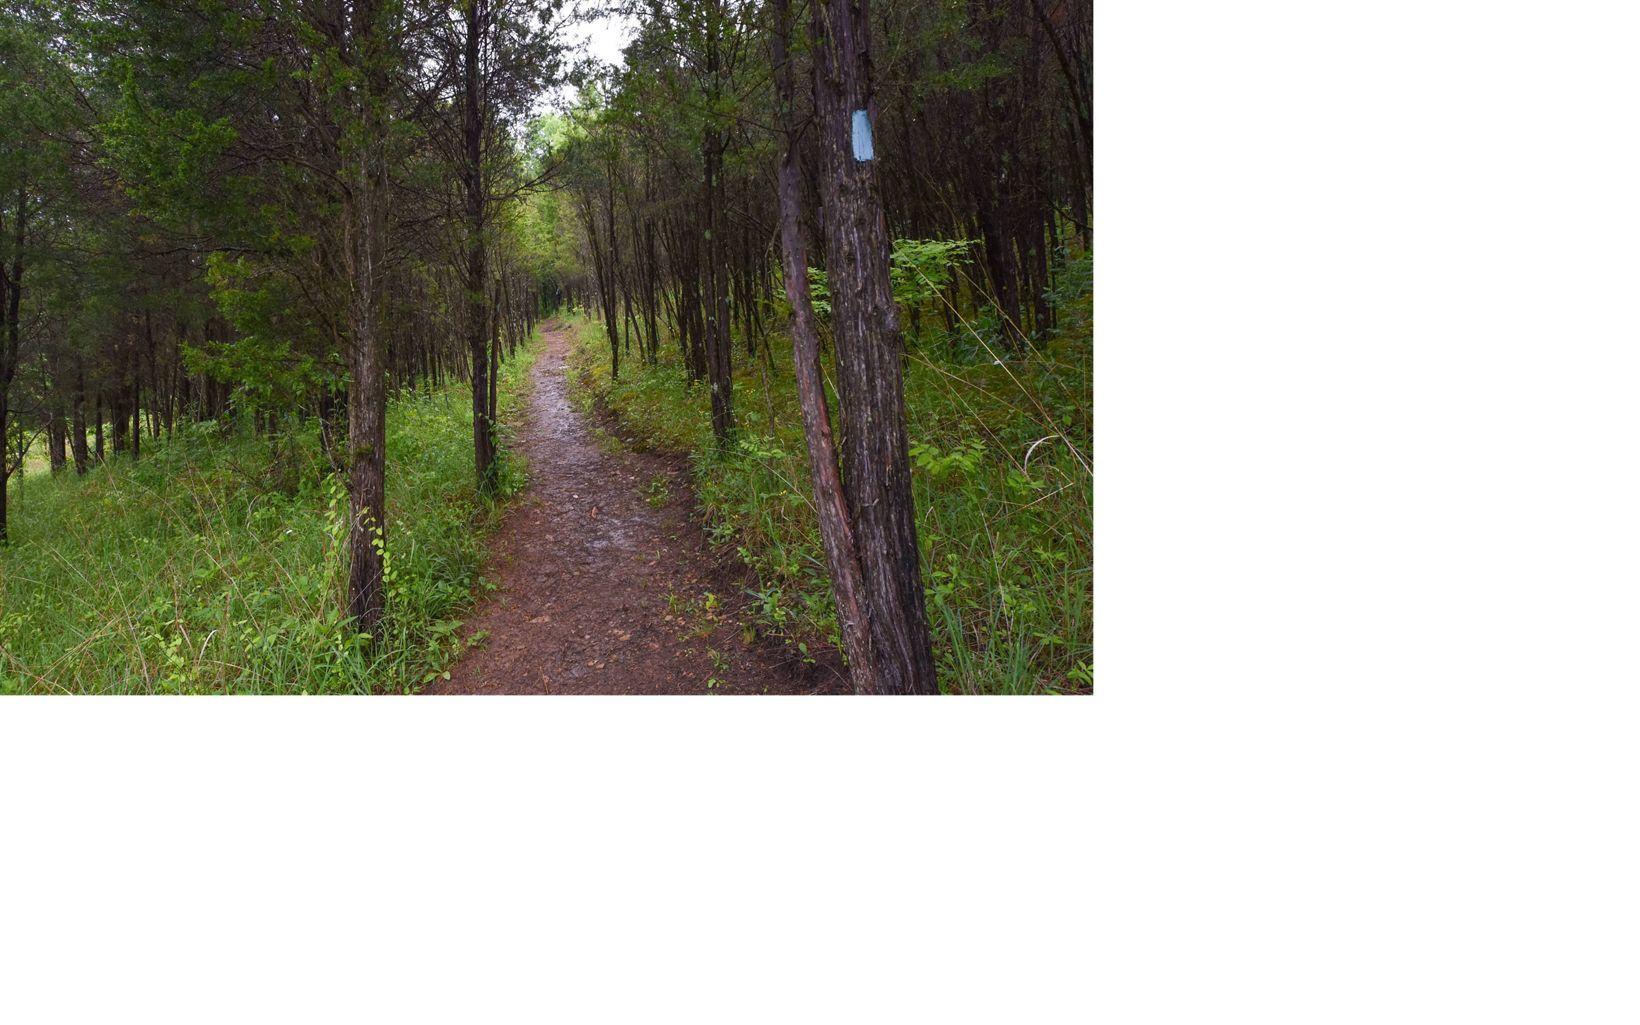 Edge of Appalachia, Portman Trail